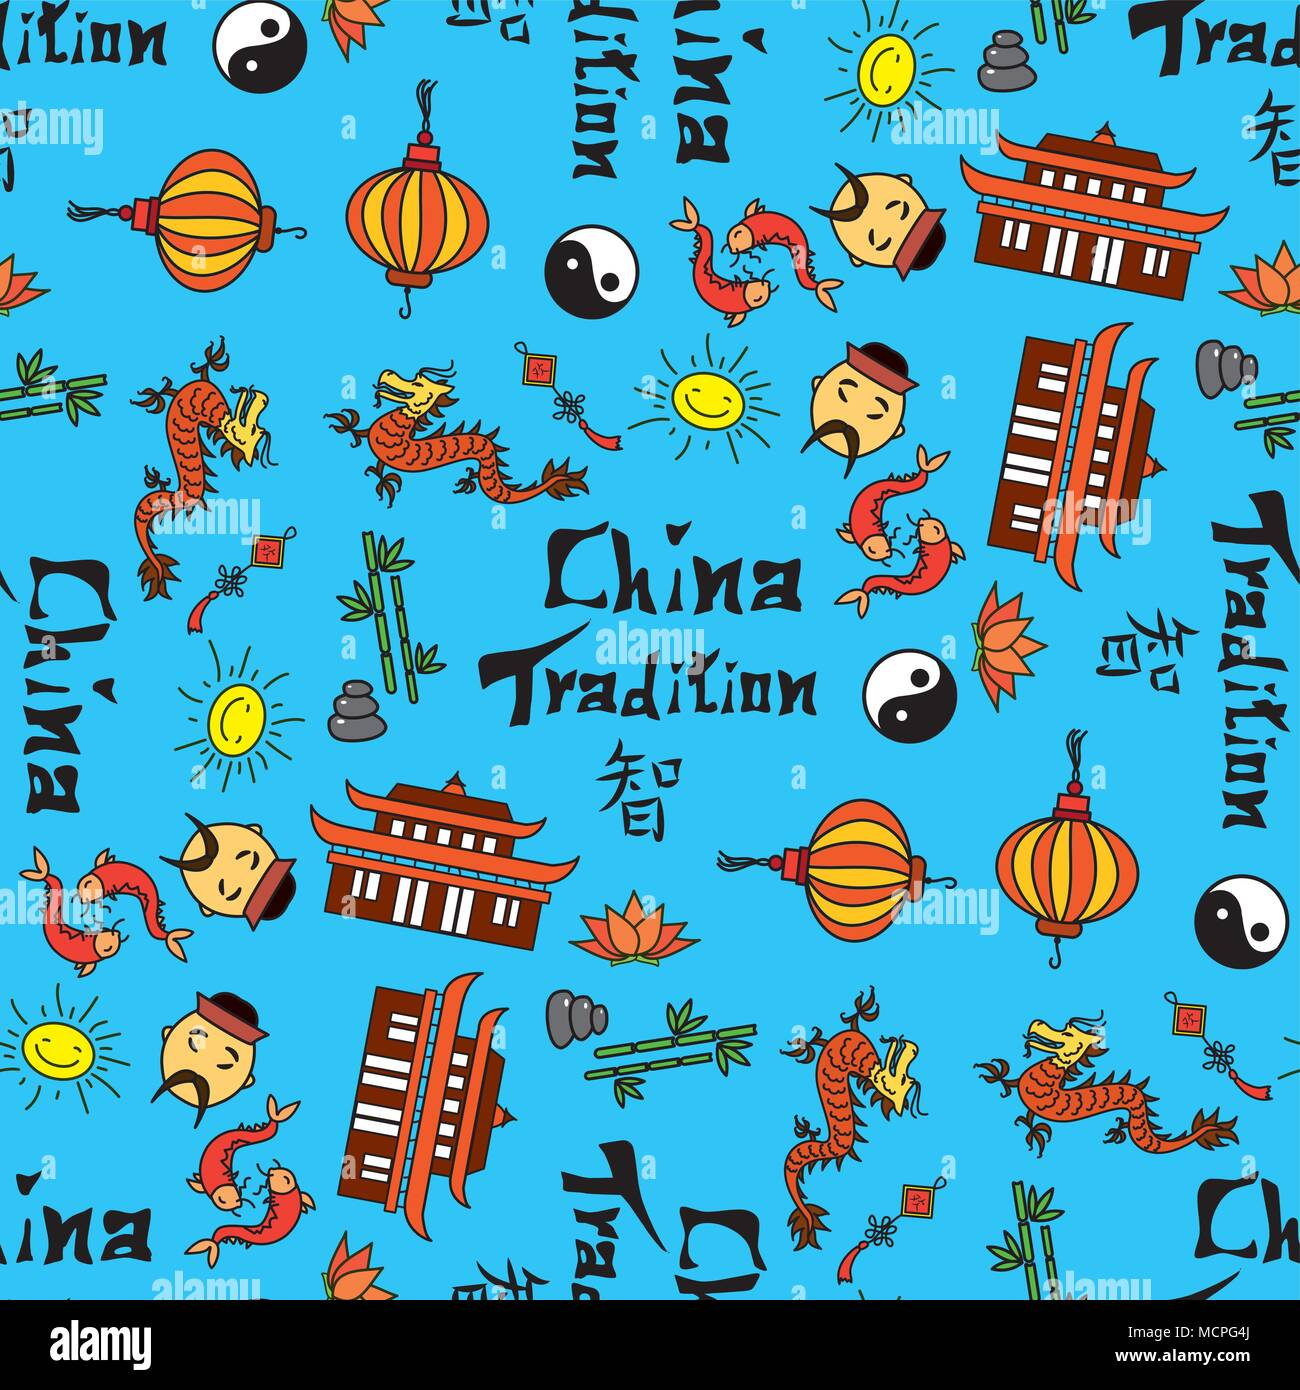 China Symbol And Hieroglyph Seamless Pattern Stock Vector